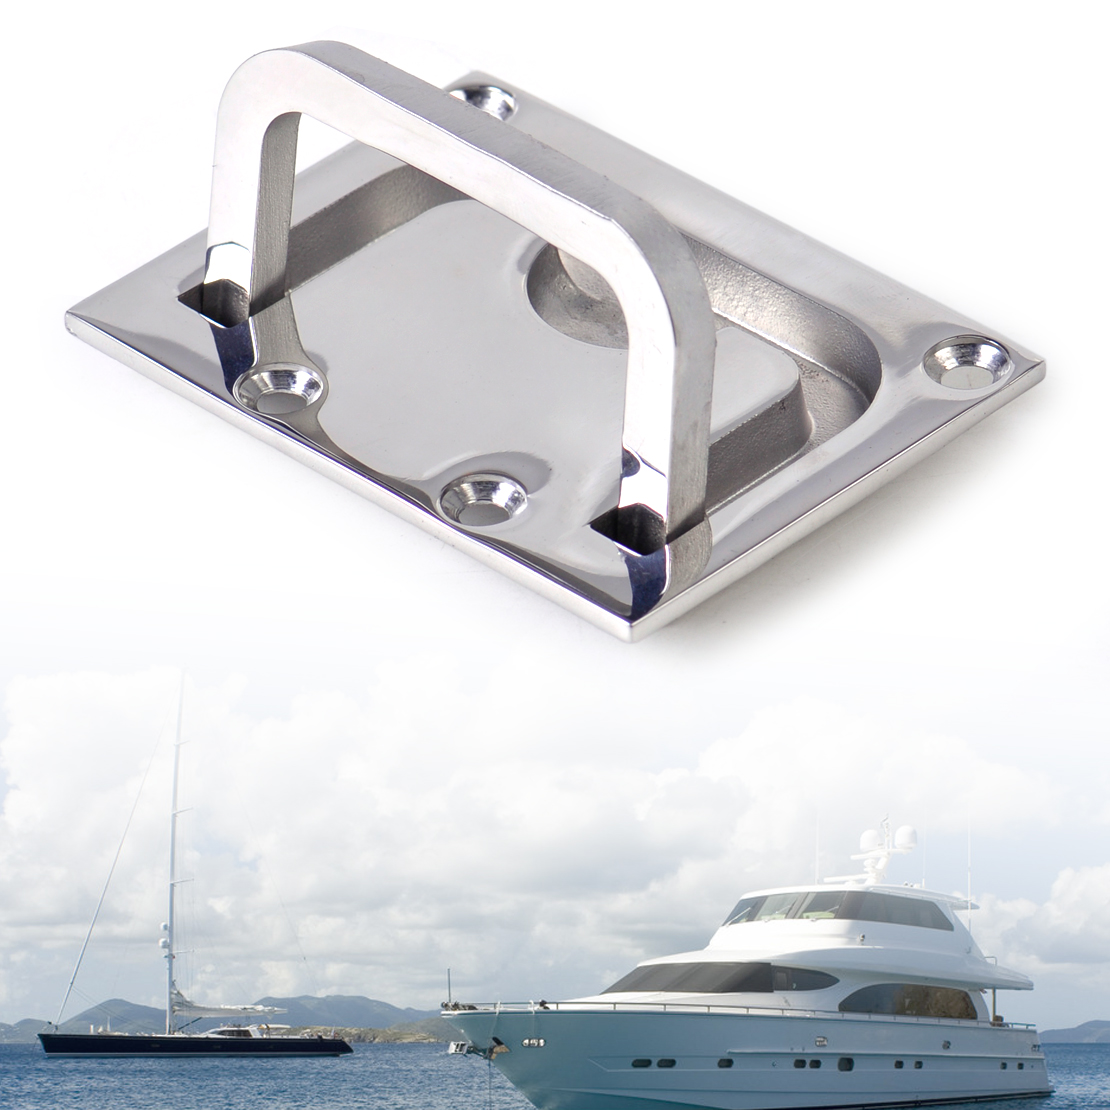 DWCX Car 316 Stainless Steel Boat Marine Flush Hatch Locker Cabinet Lift Pull Handle Boat Hatch Handle 7.5 x 5.5 cm Flush Mount